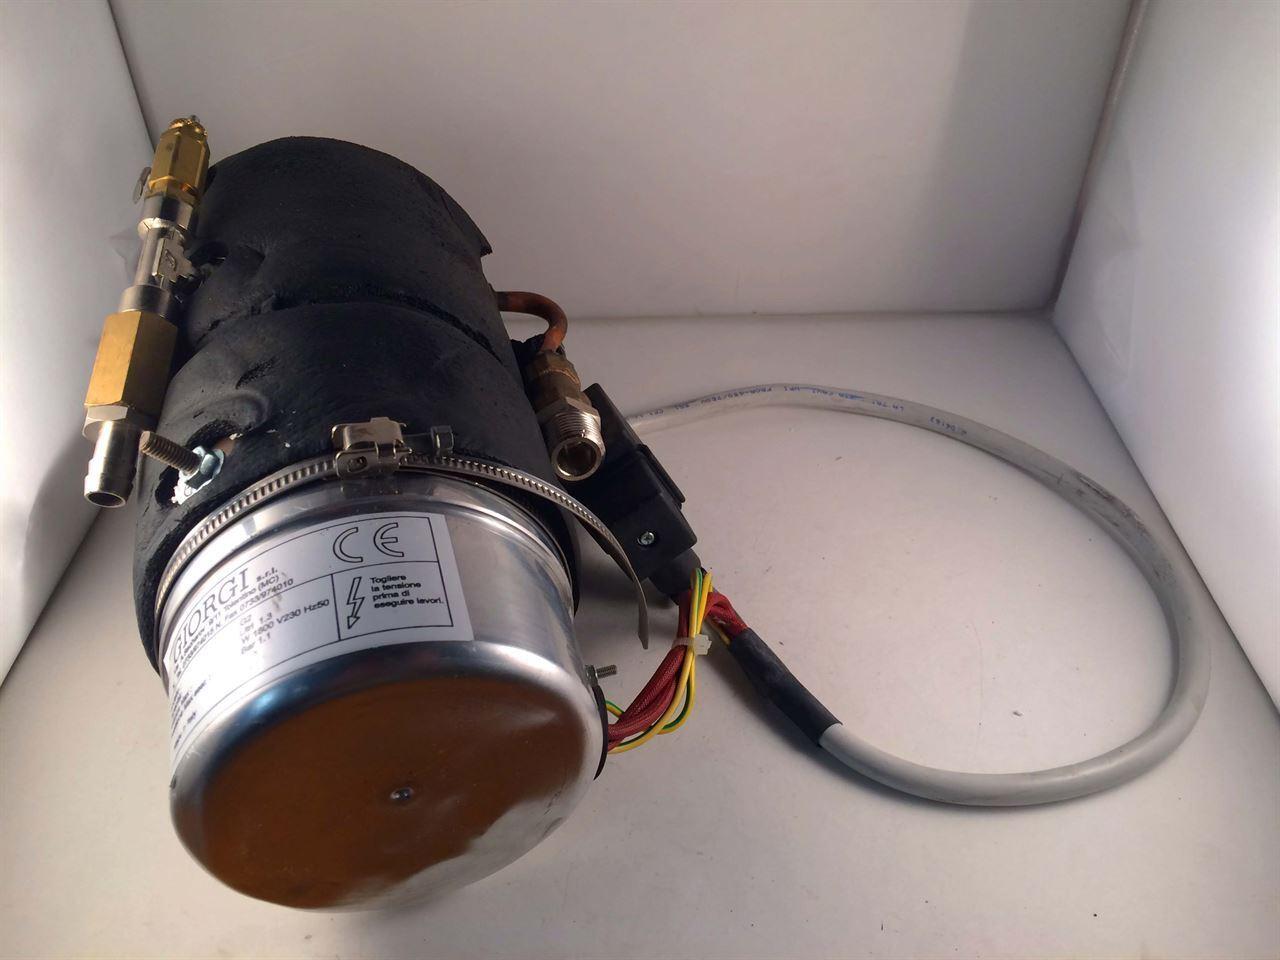 Ricambio caldaia w1800  box doccia Titan grupcaldtit